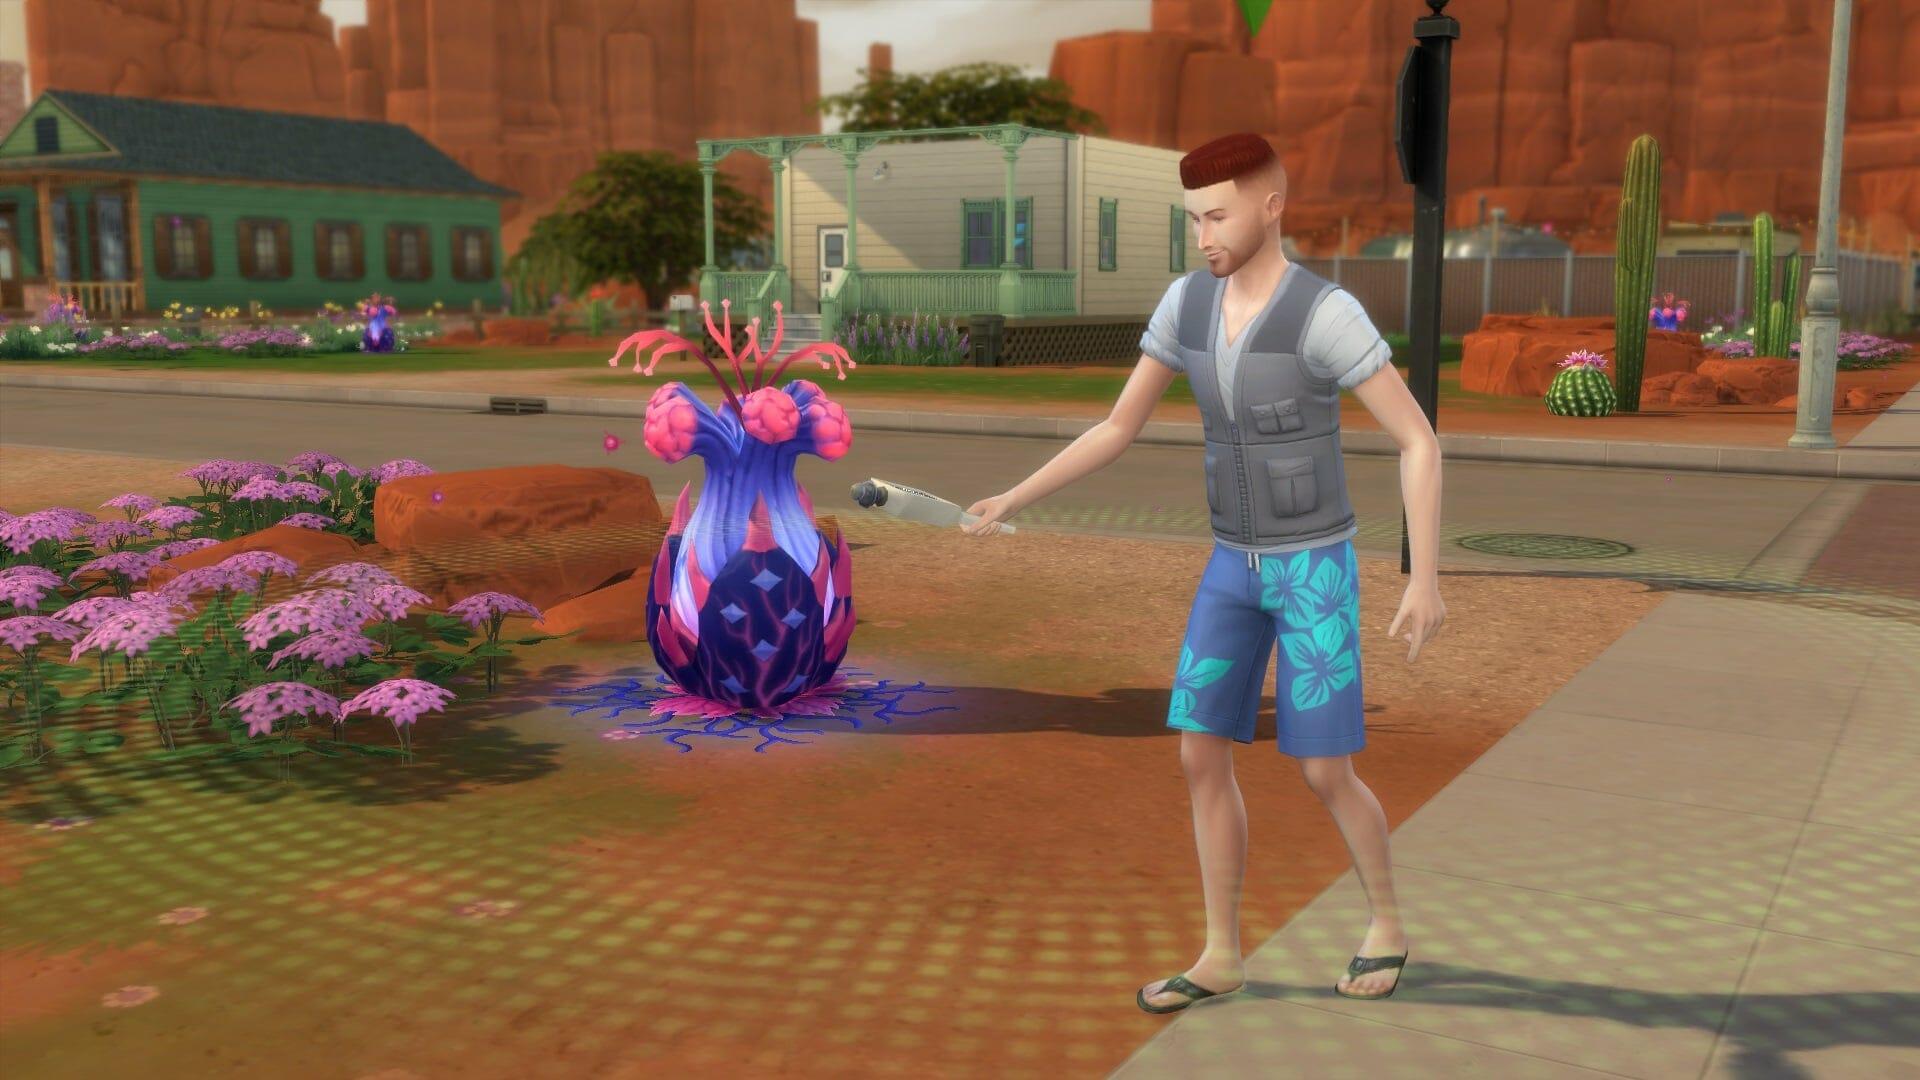 Plantes sims 4 stranger ville